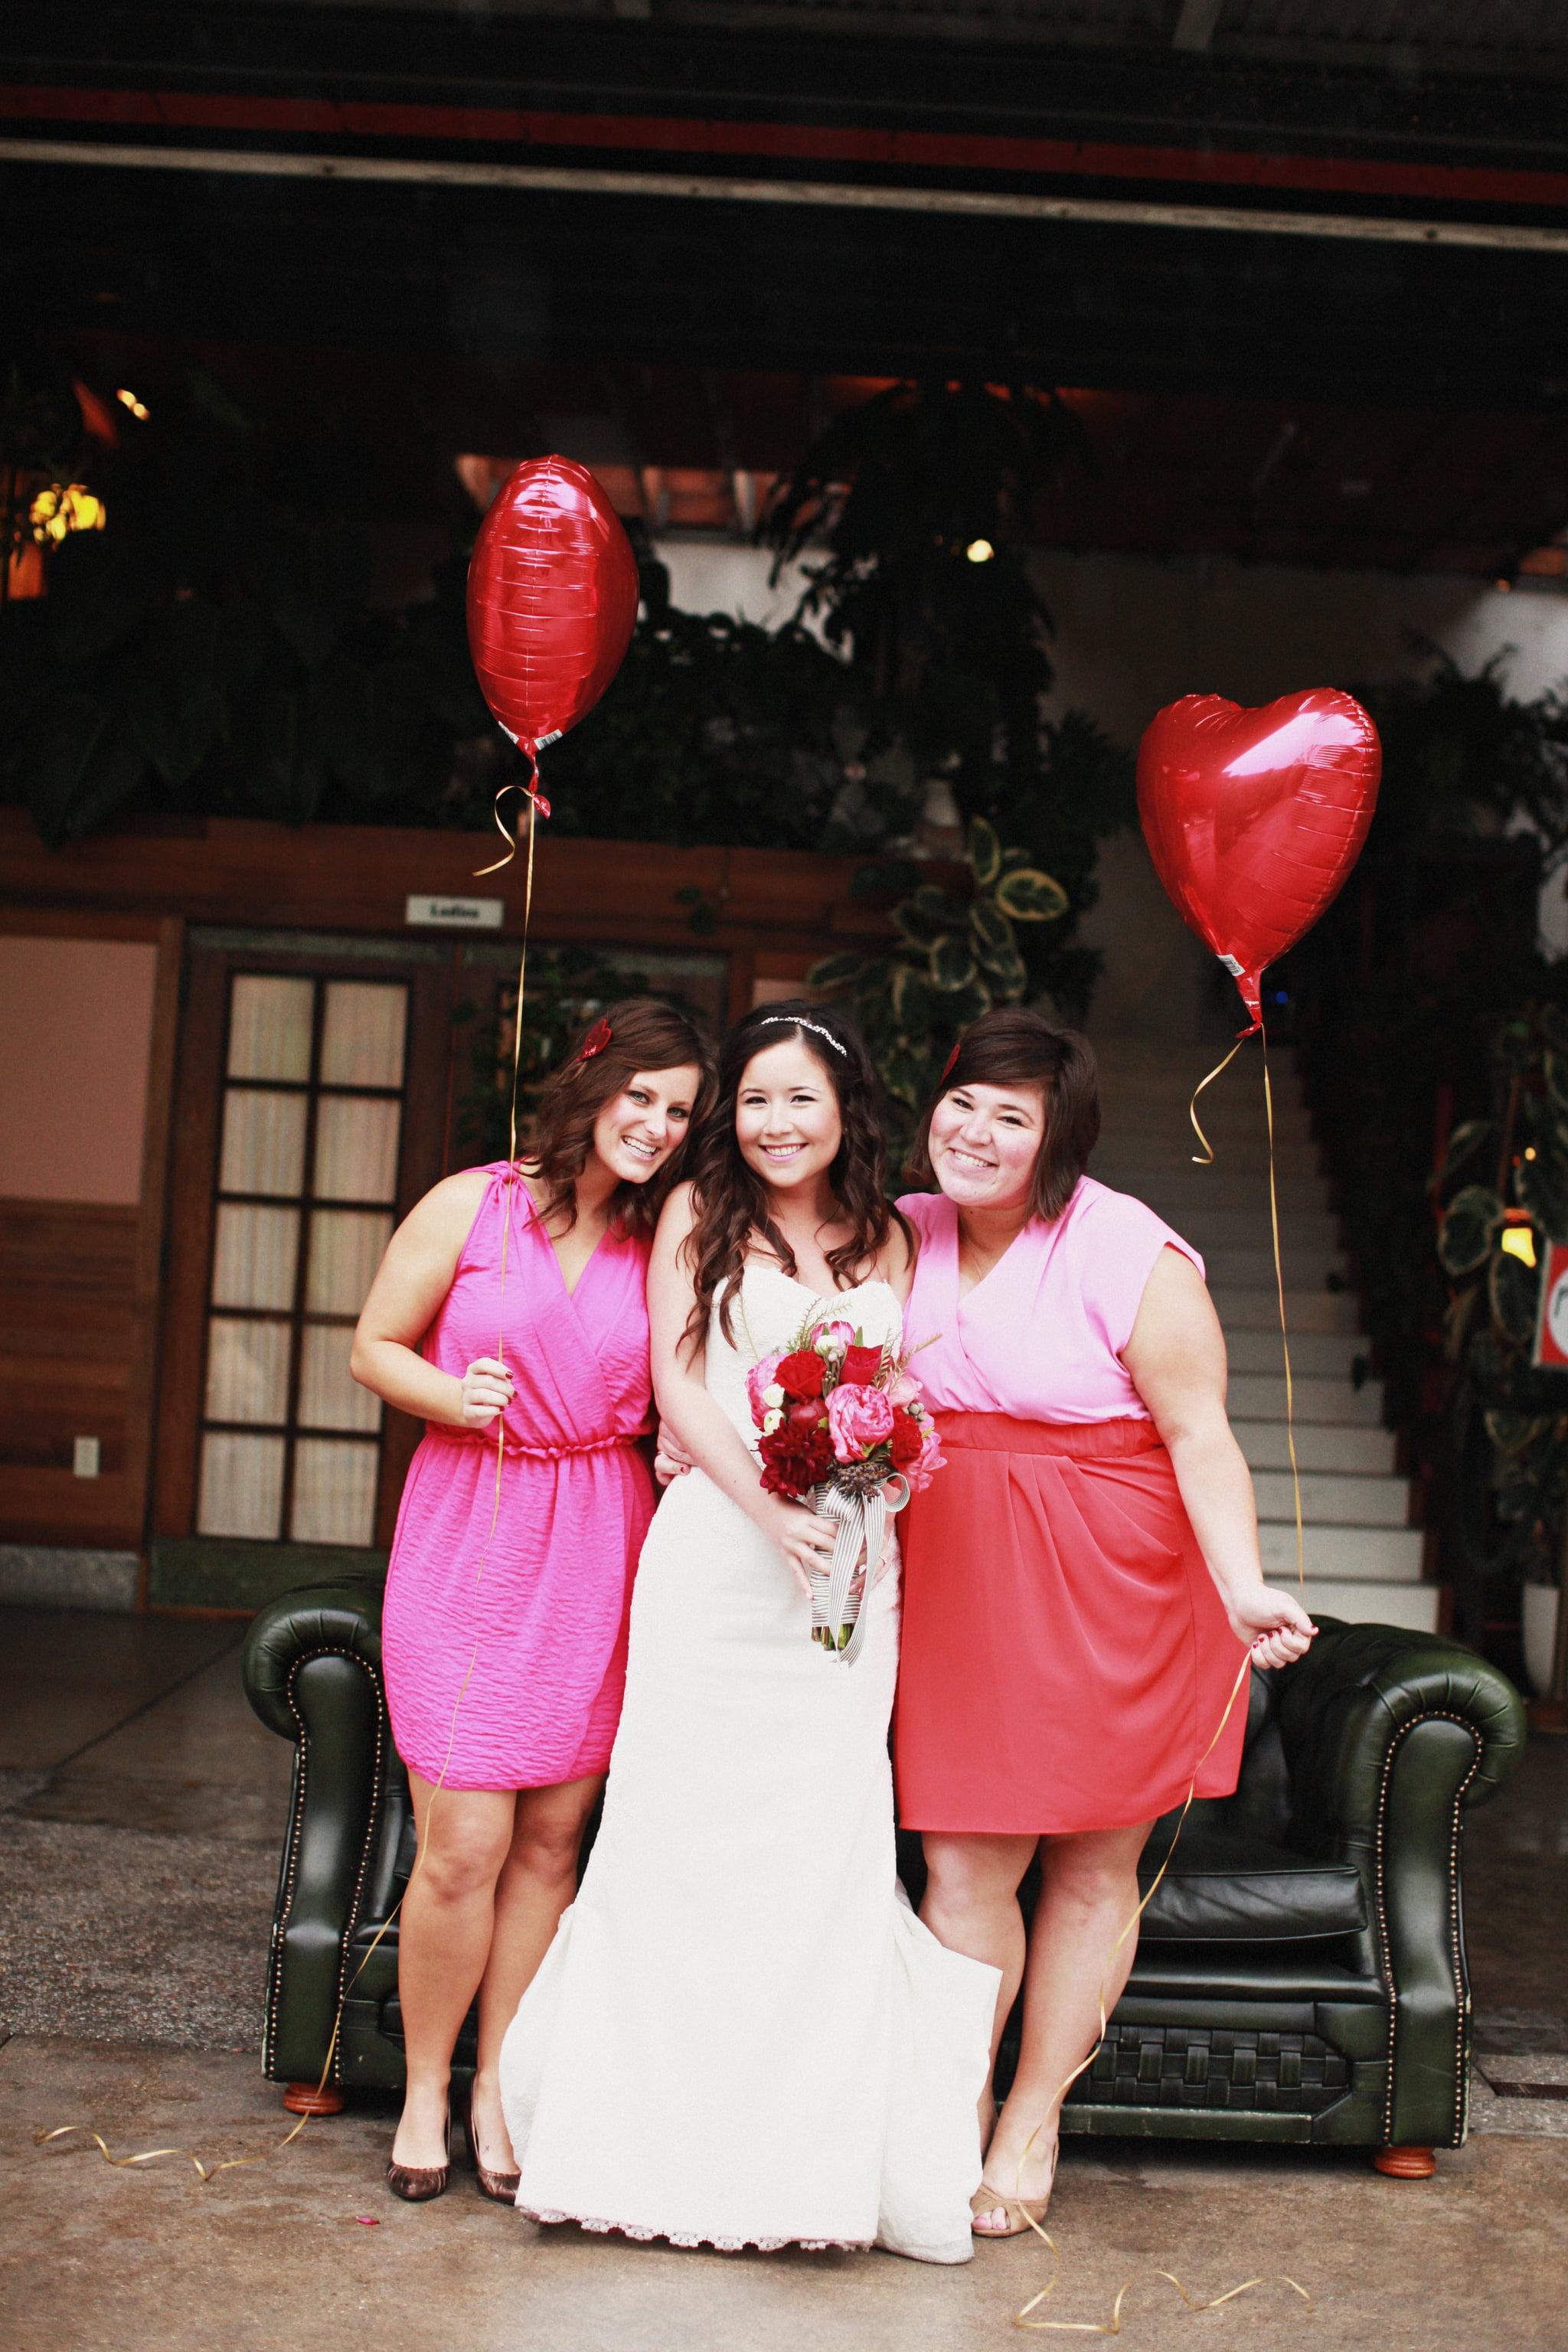 Bridesmaid Heart Balloons